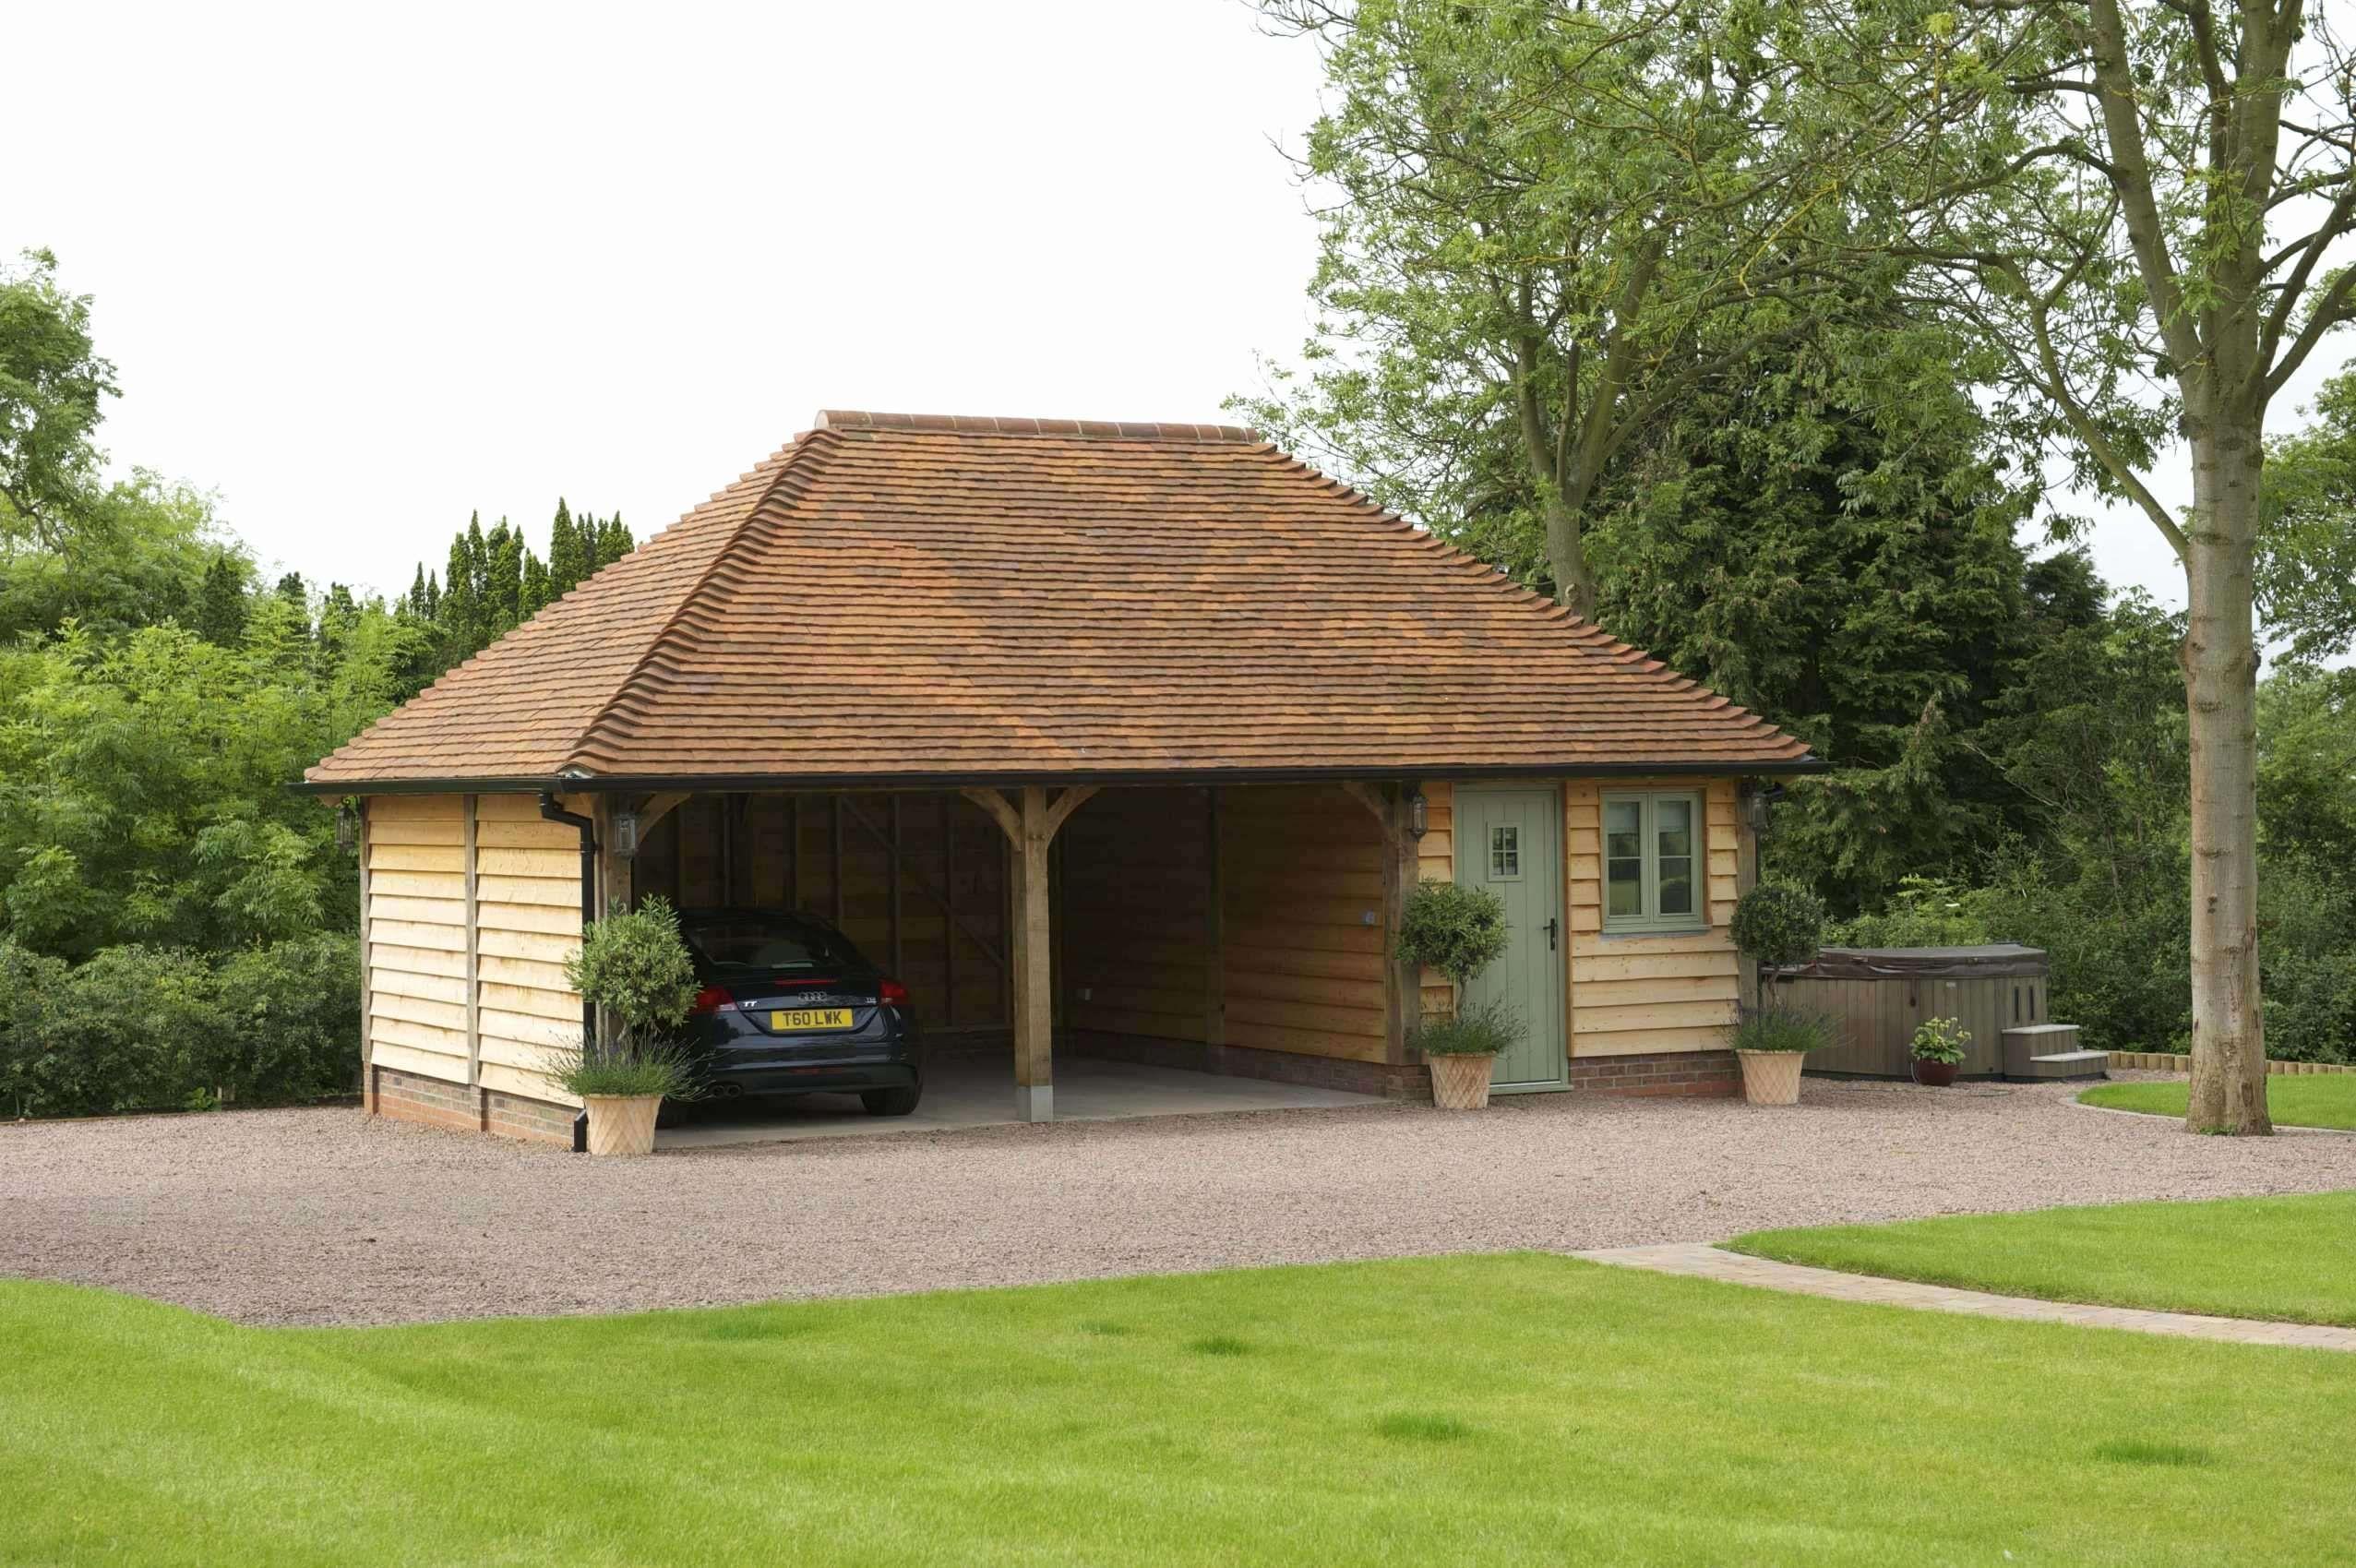 25 Awesome Wood Carports Diy carport, Portable carport